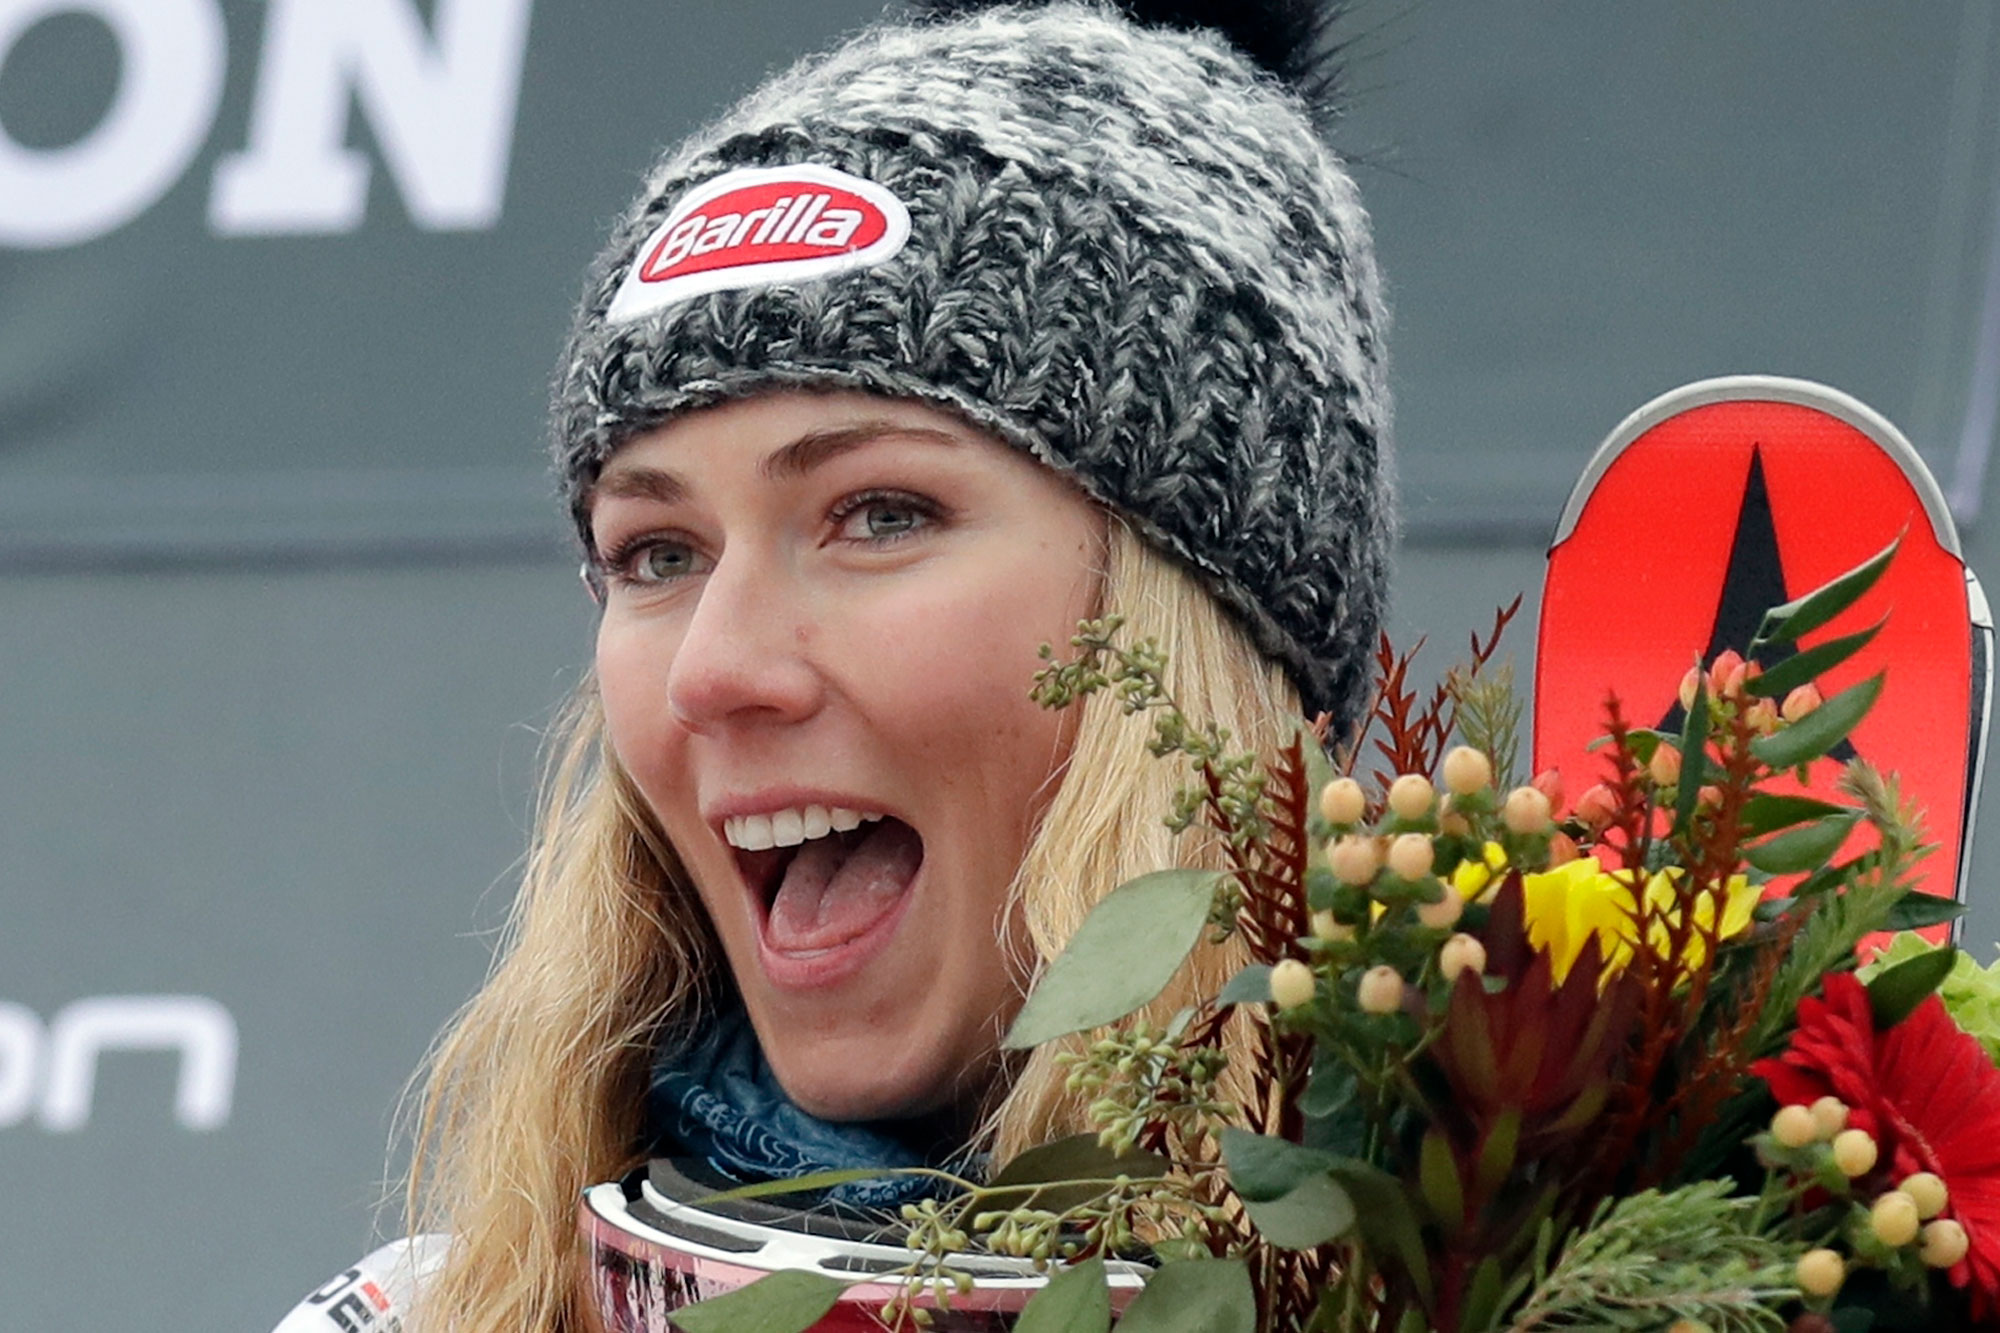 Photo: World Cup Slalom | Mikaela Shiffrin Killington 2018 - AP